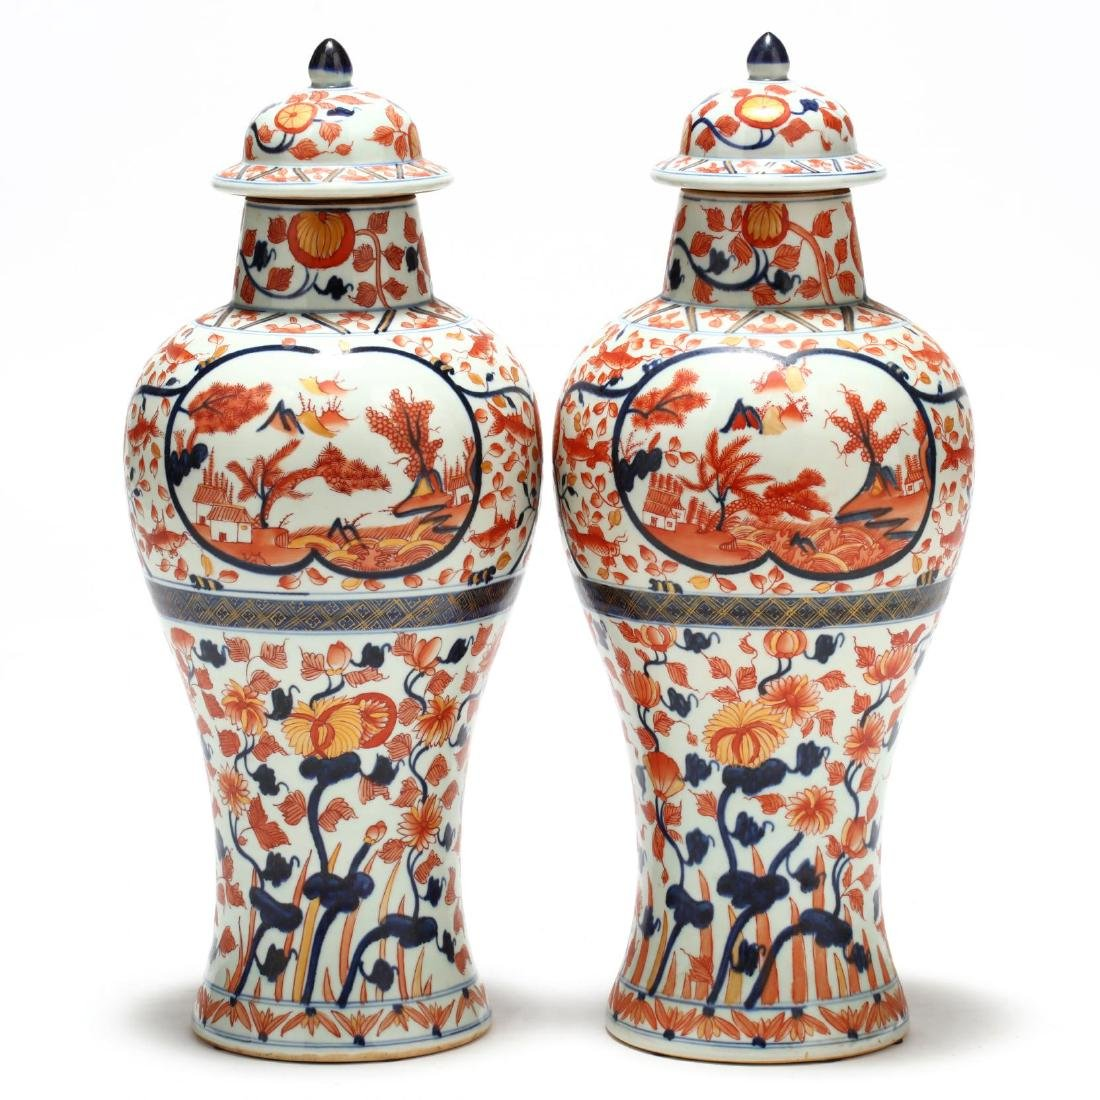 A Pair of Japanese Imari Covered Jars